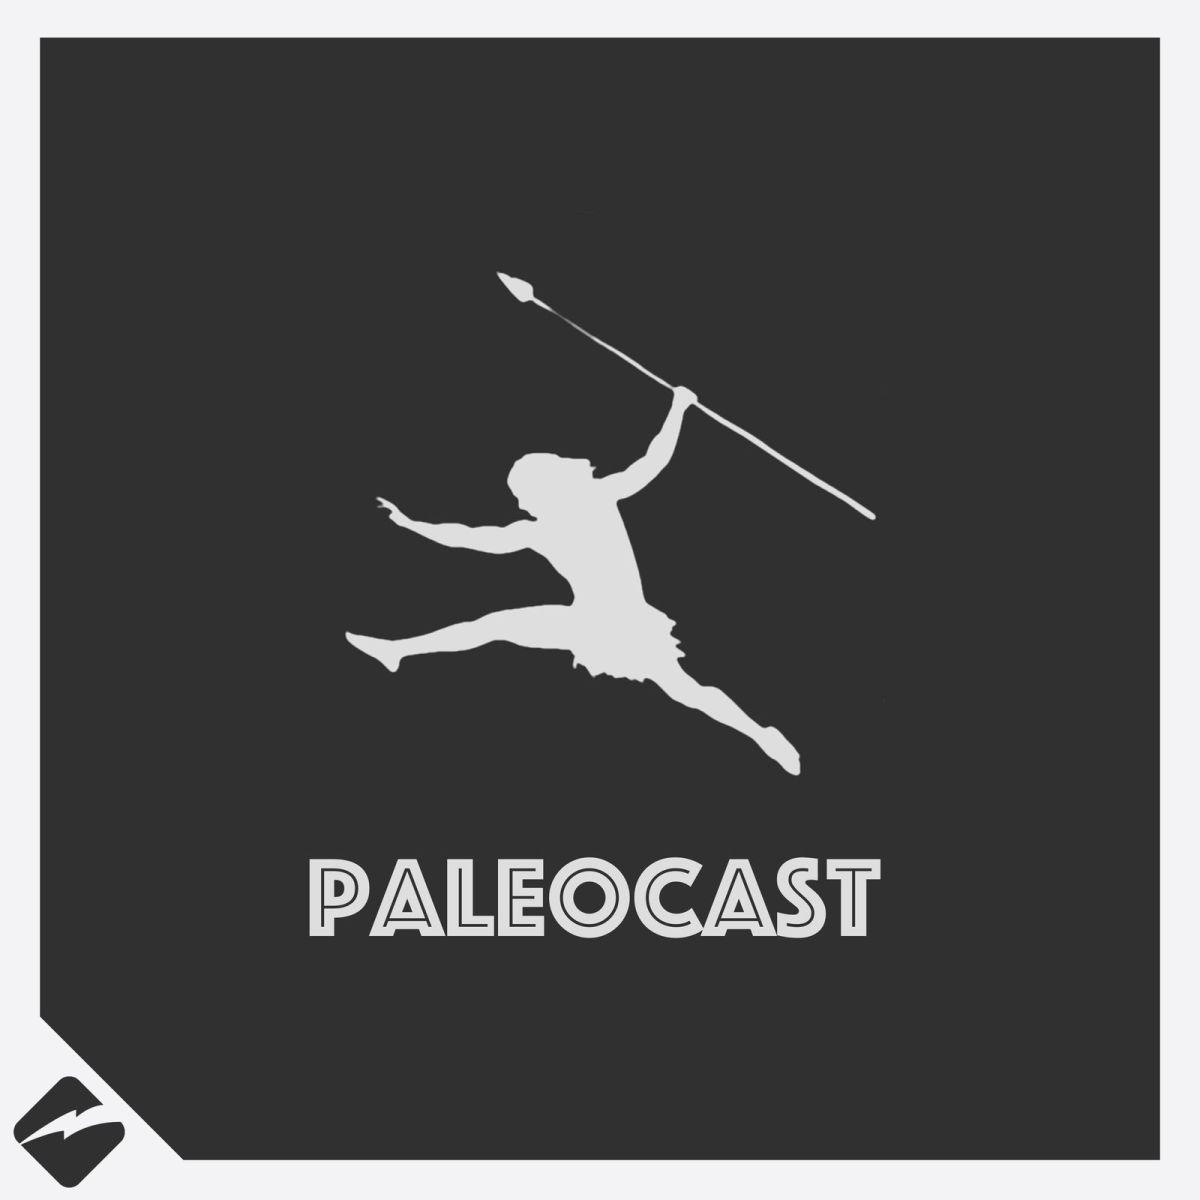 Paleocast